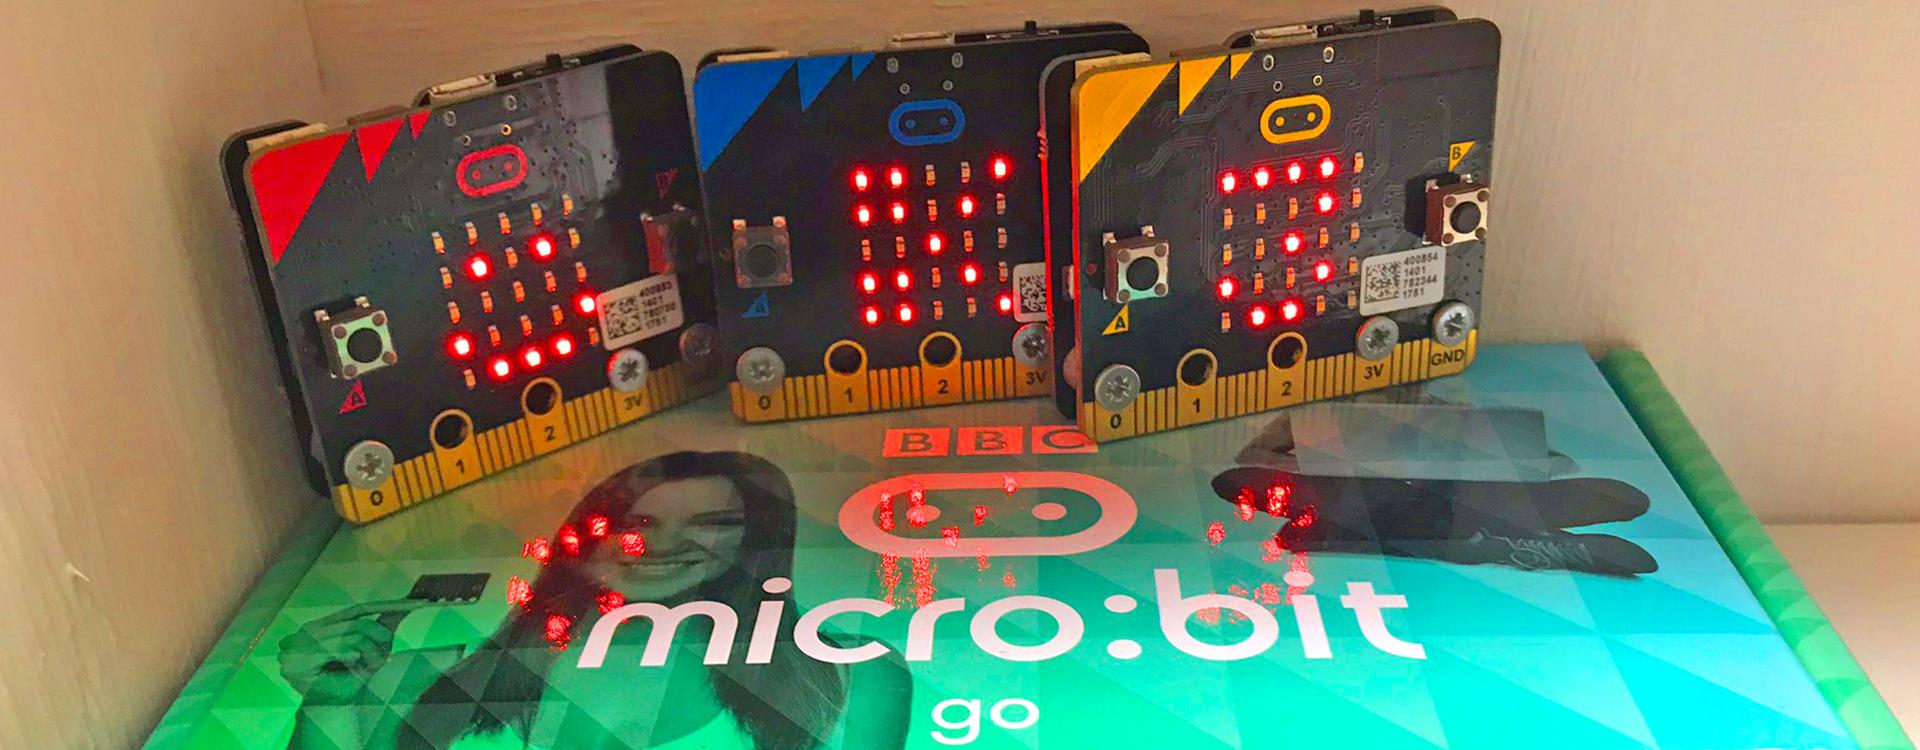 Programmera micro:bit